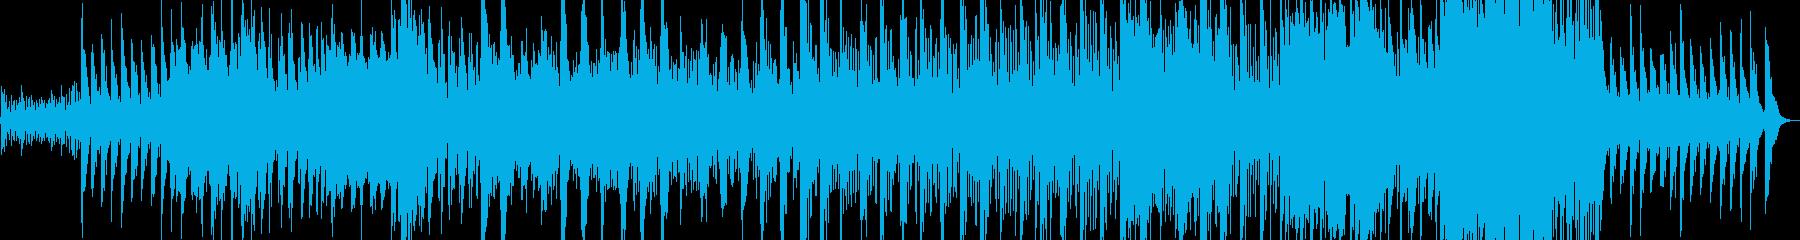 Chamber orchestraの再生済みの波形